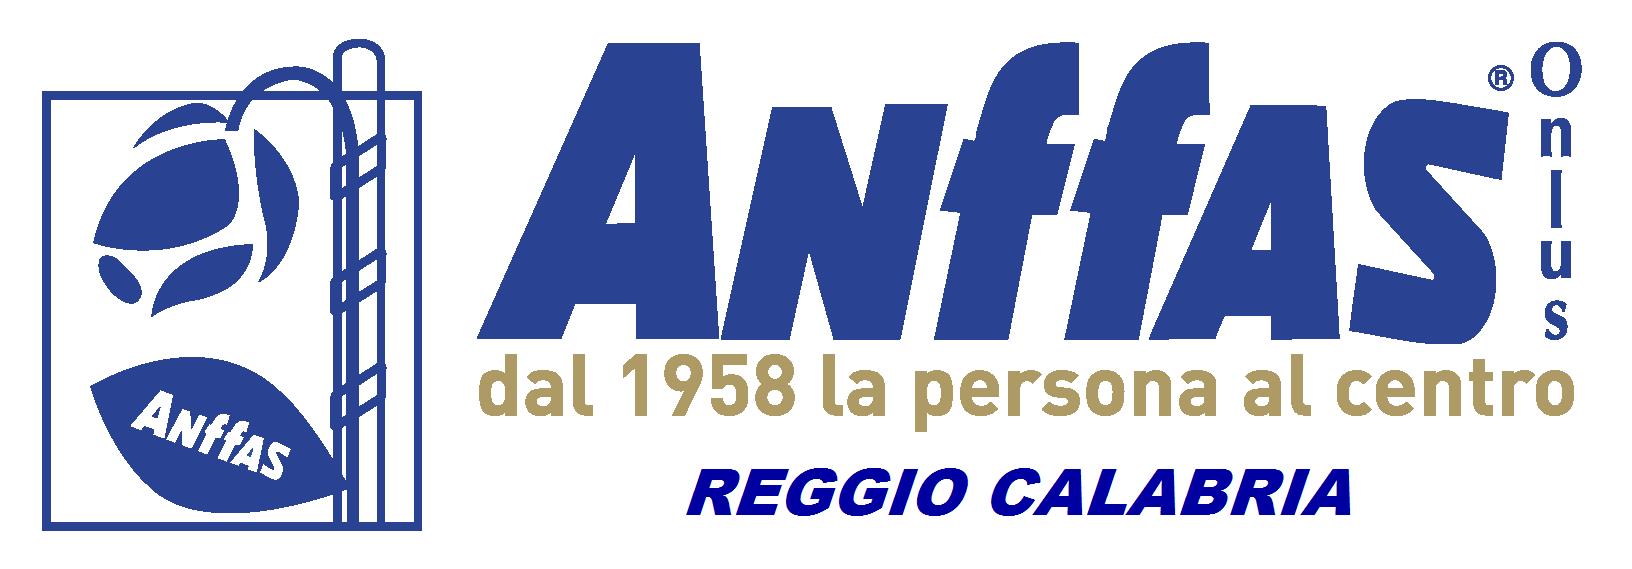 ANFFAS ONLUS Reggio Calabria